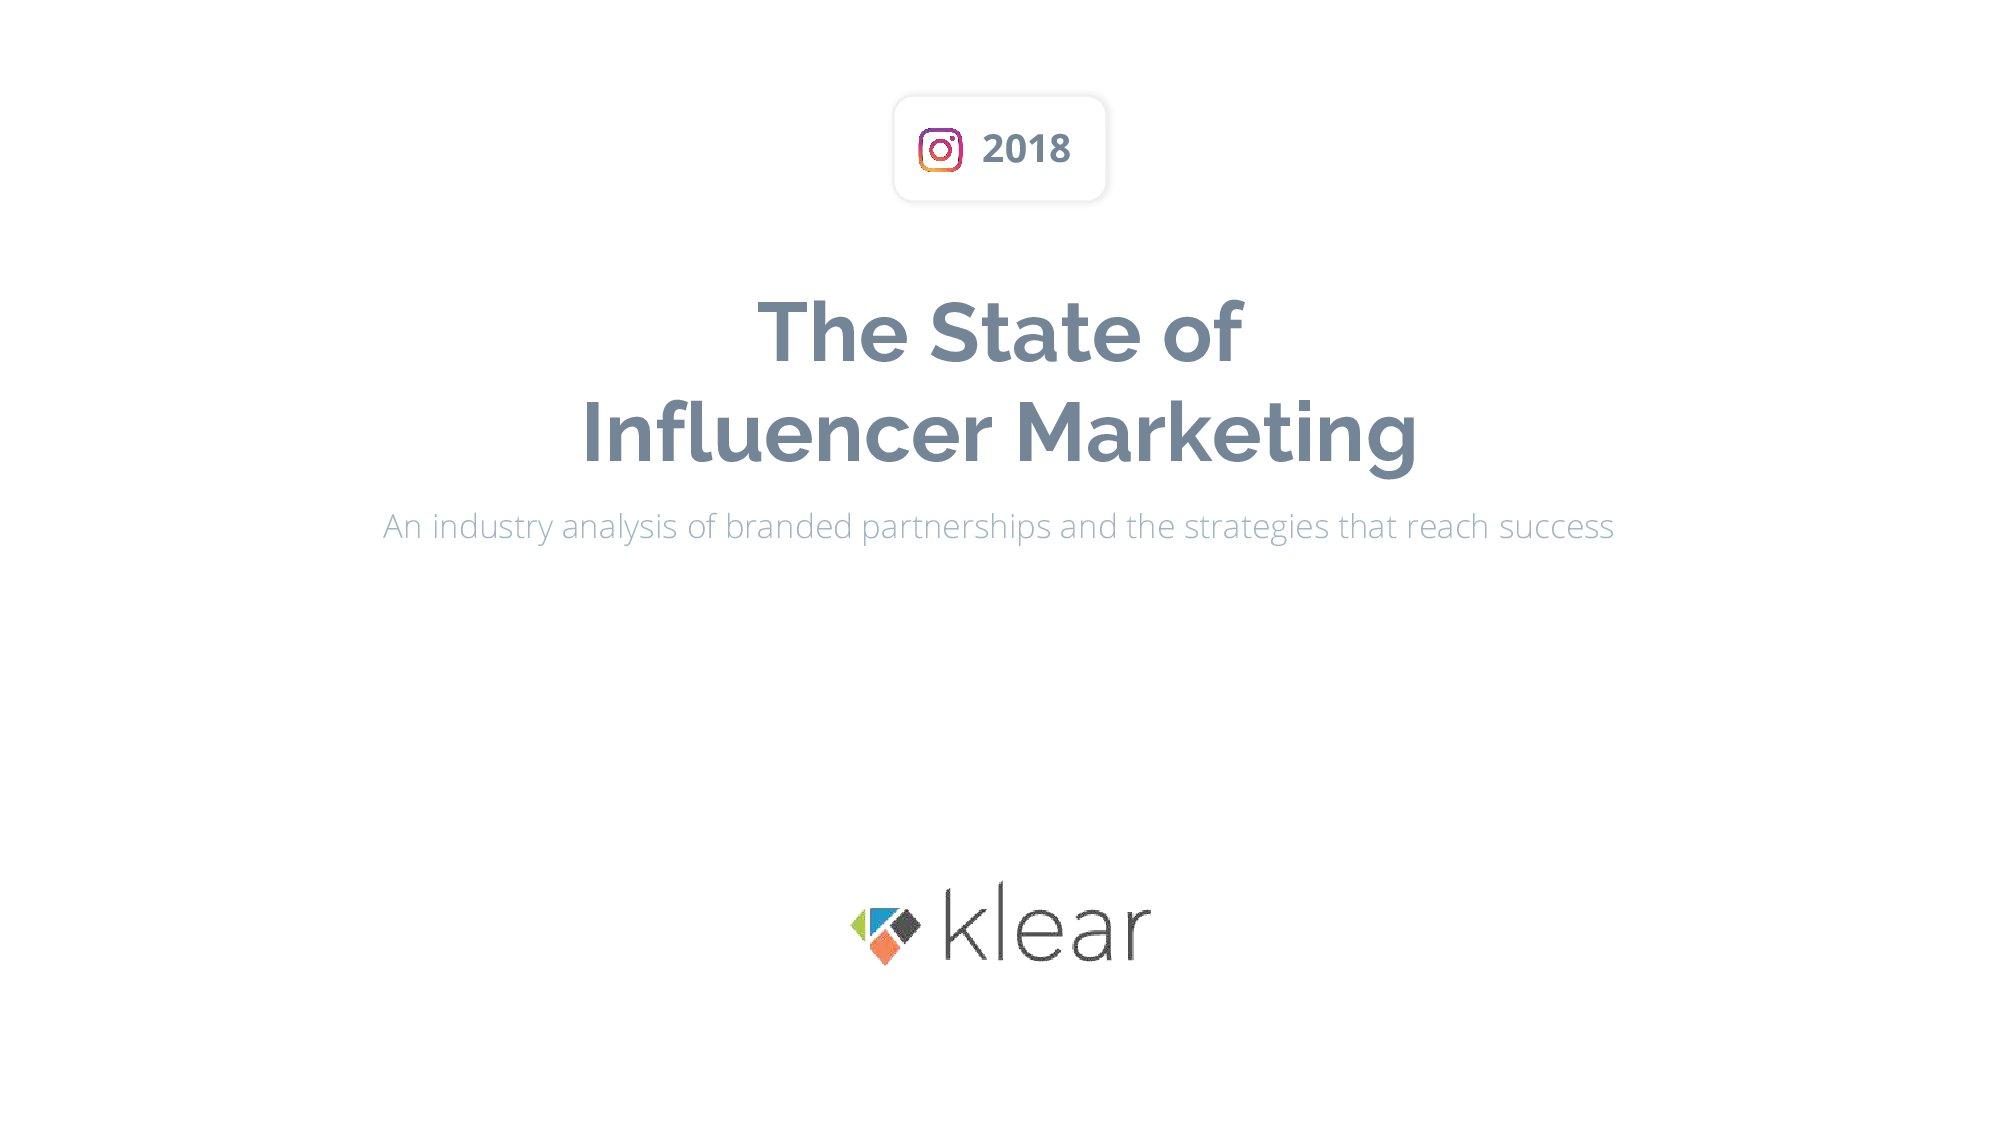 Klear:2018年Instagram意见领袖营销报告